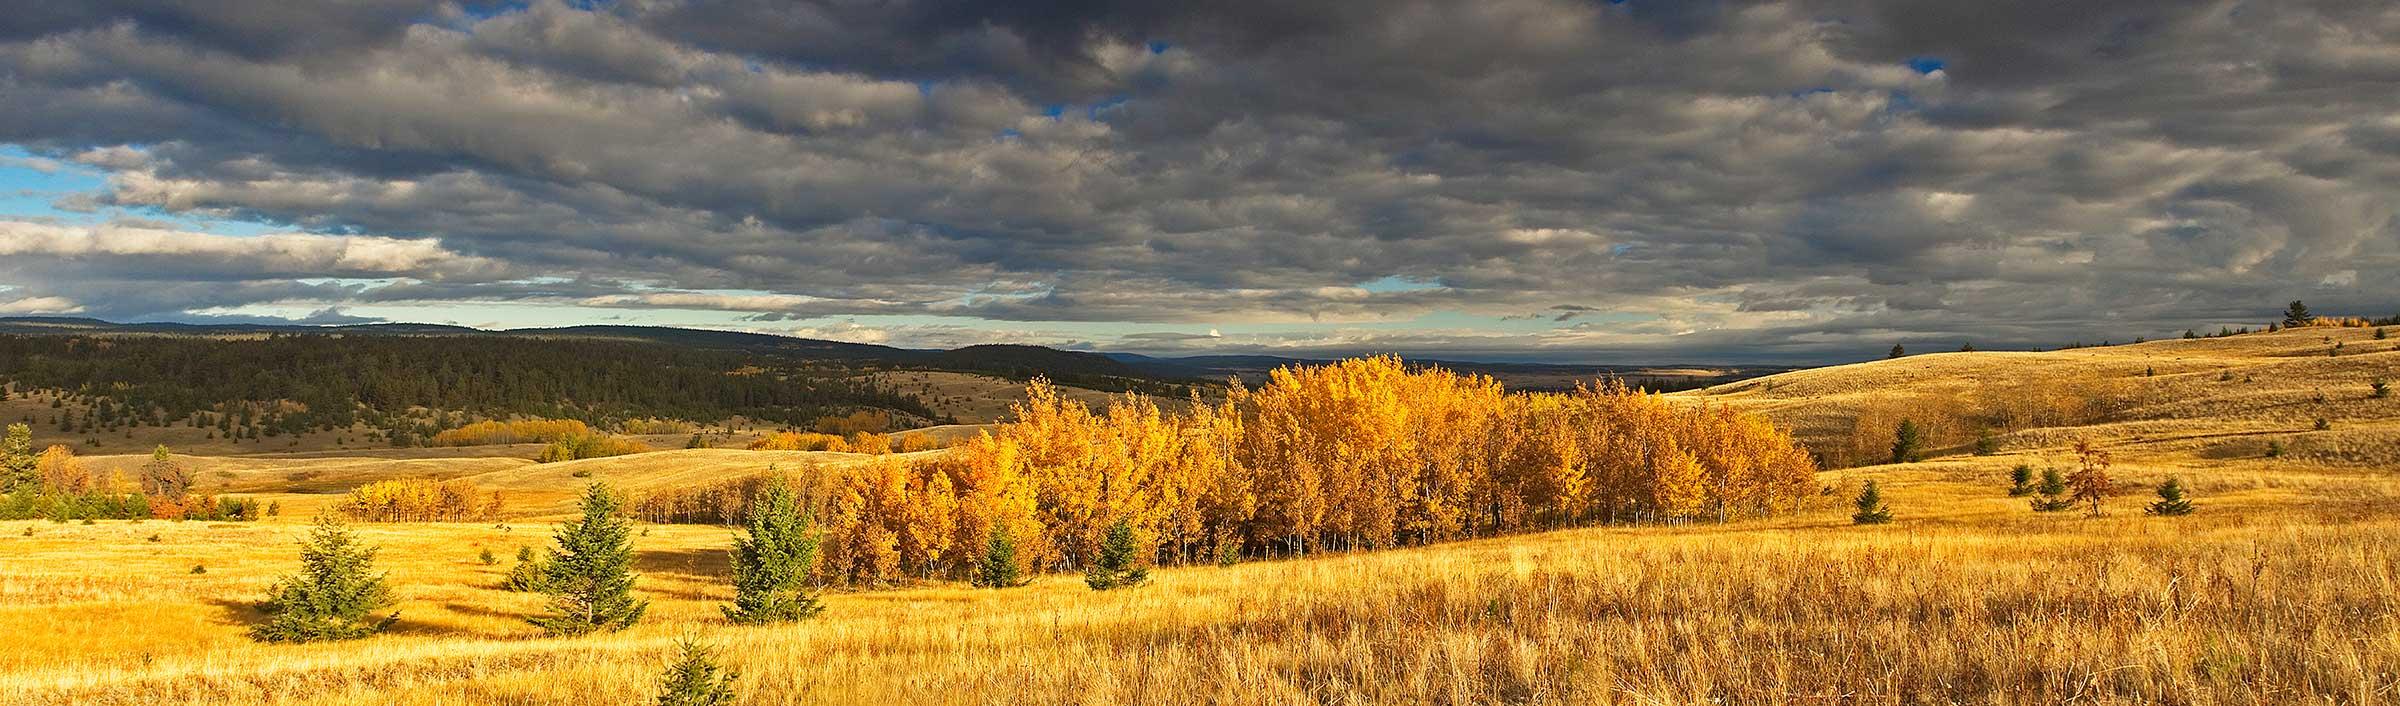 Grasslands Conservation Council of BC